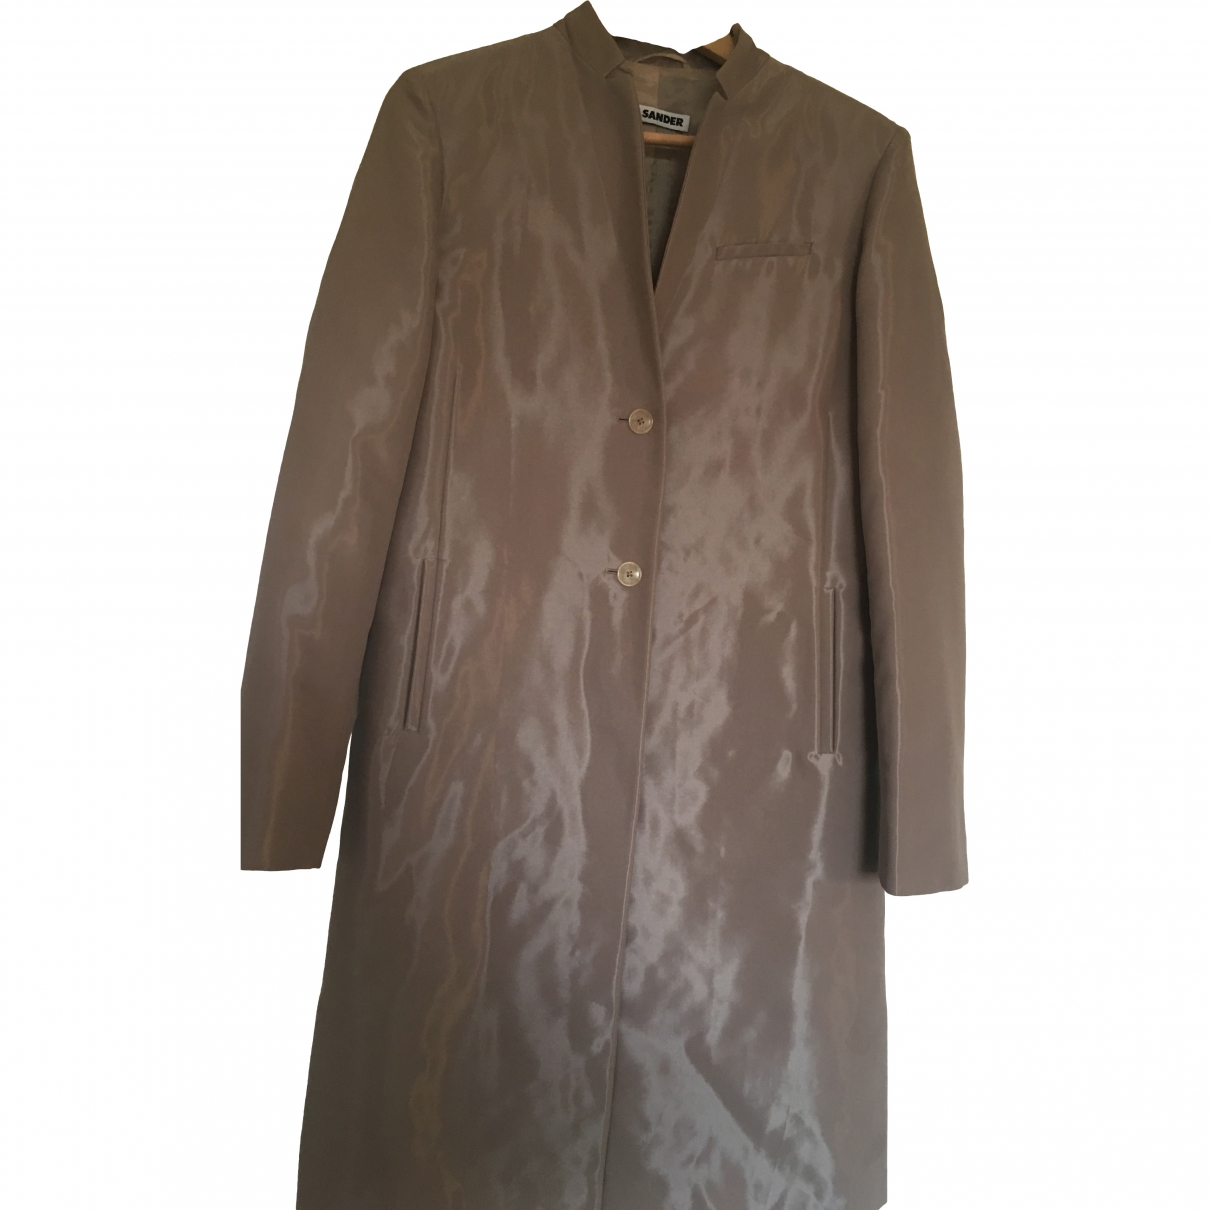 Jil Sander \N Beige Cotton coat for Women 38 FR